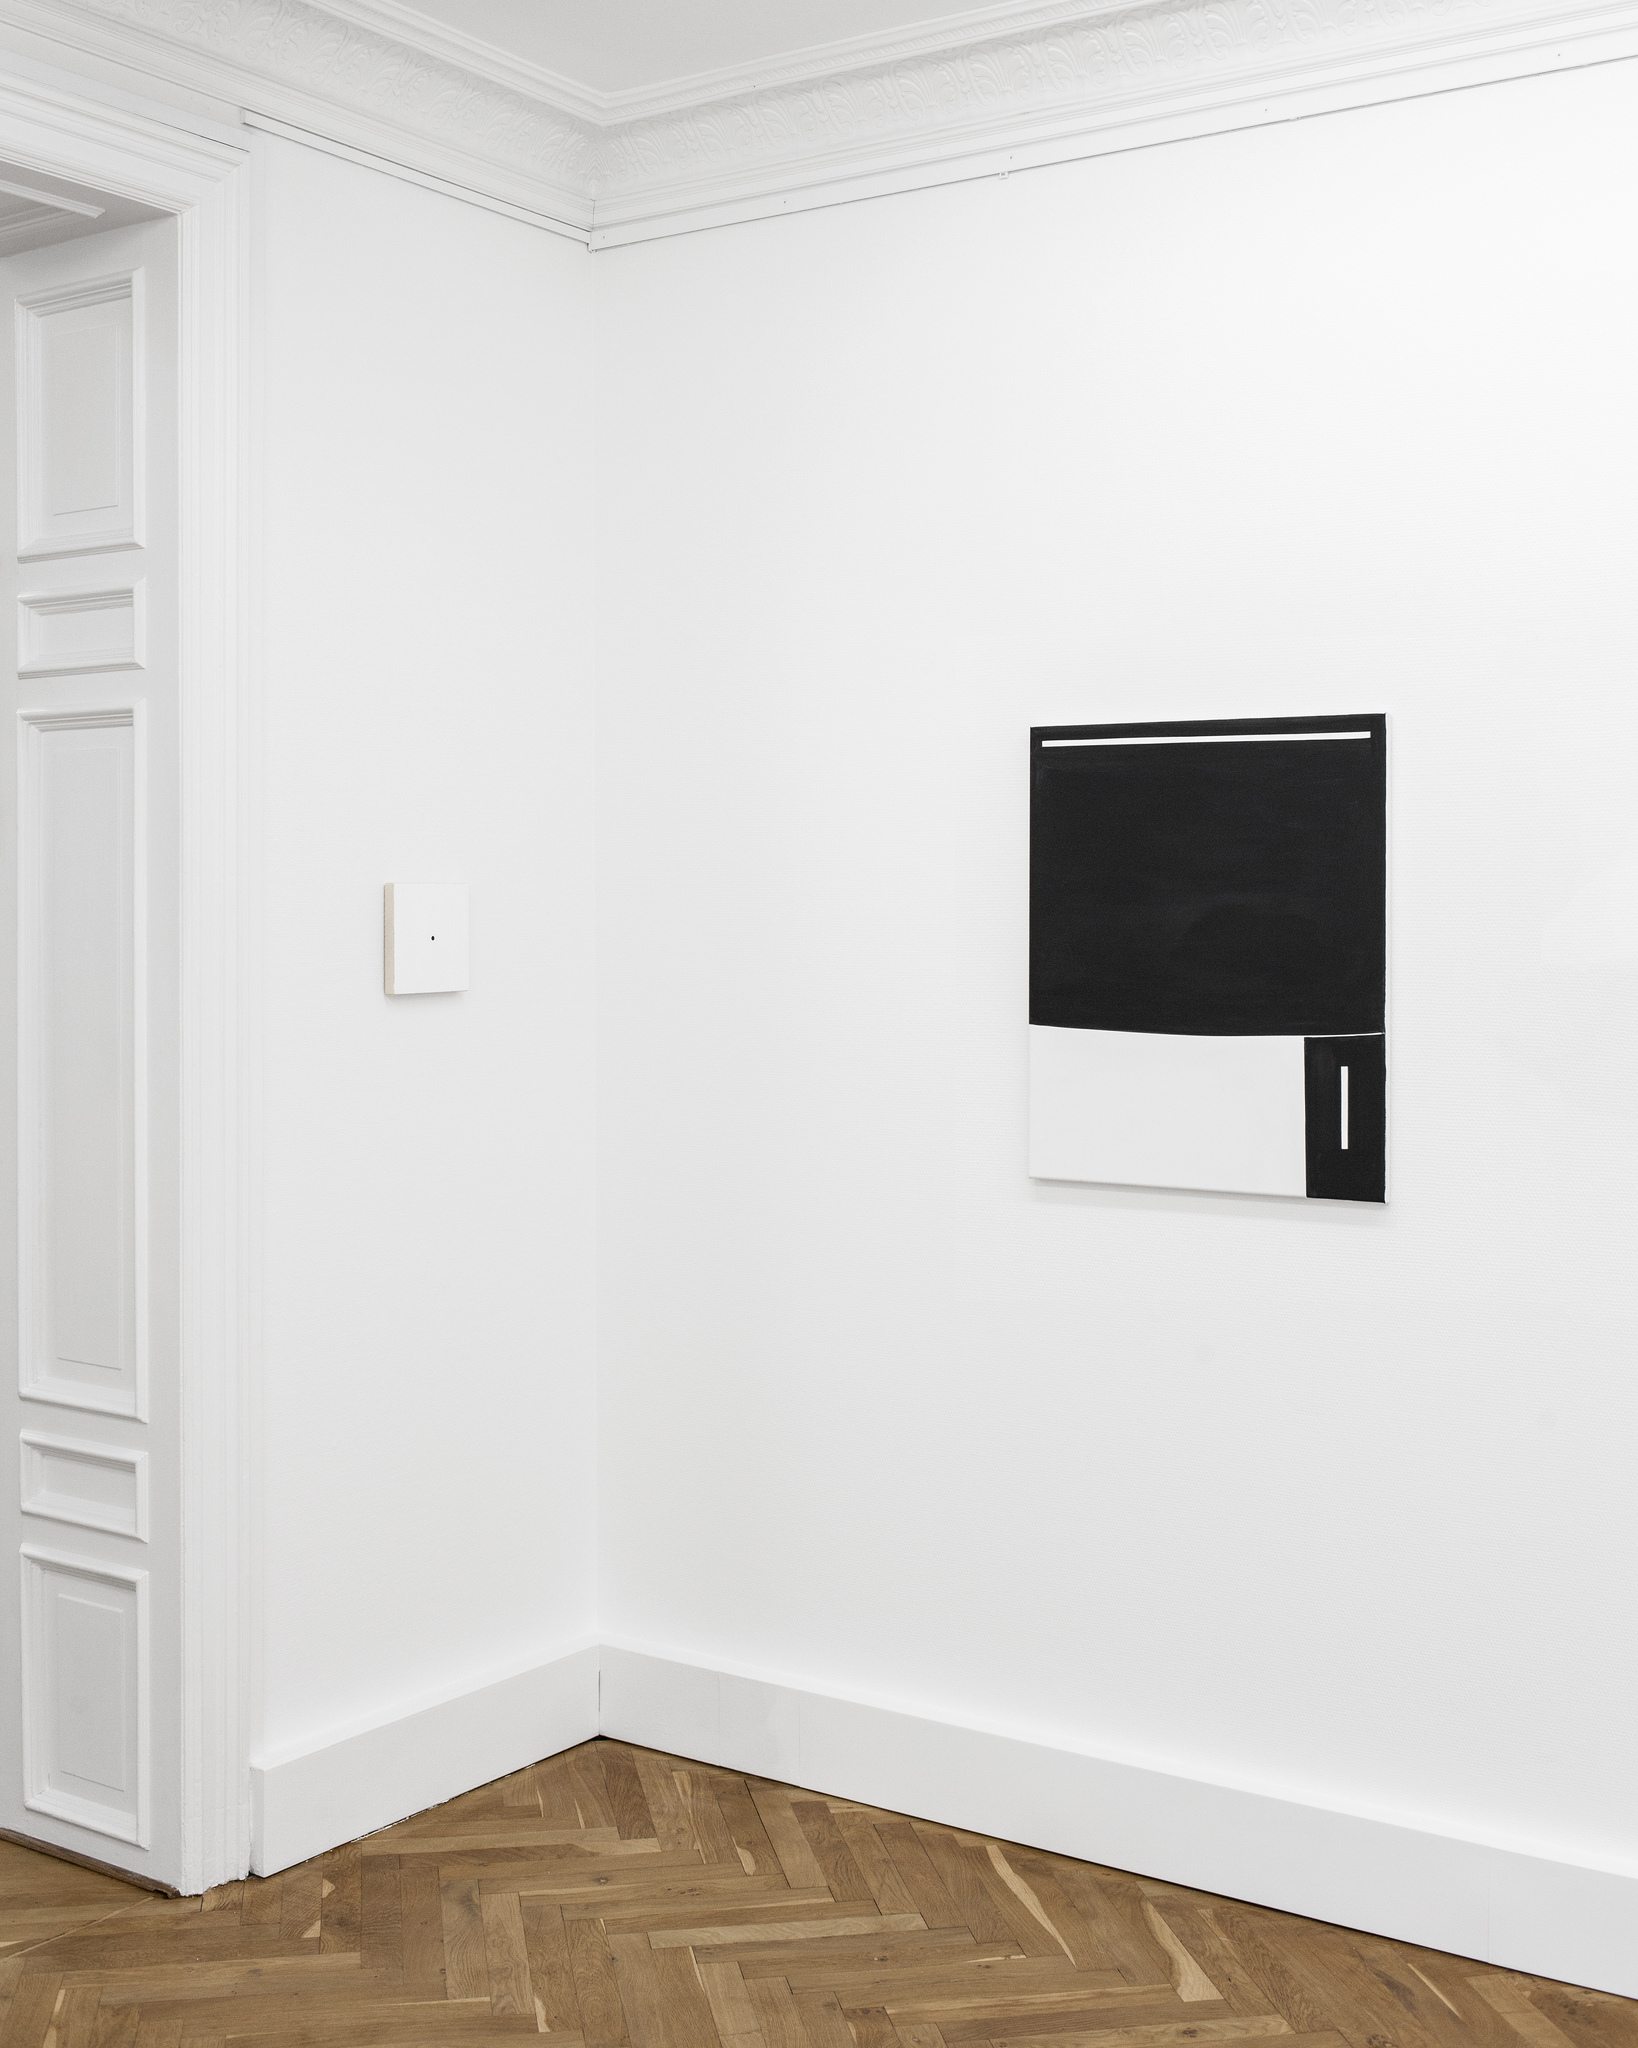 1-3-andre-butzer-matthew-feyld-sundays-gallery